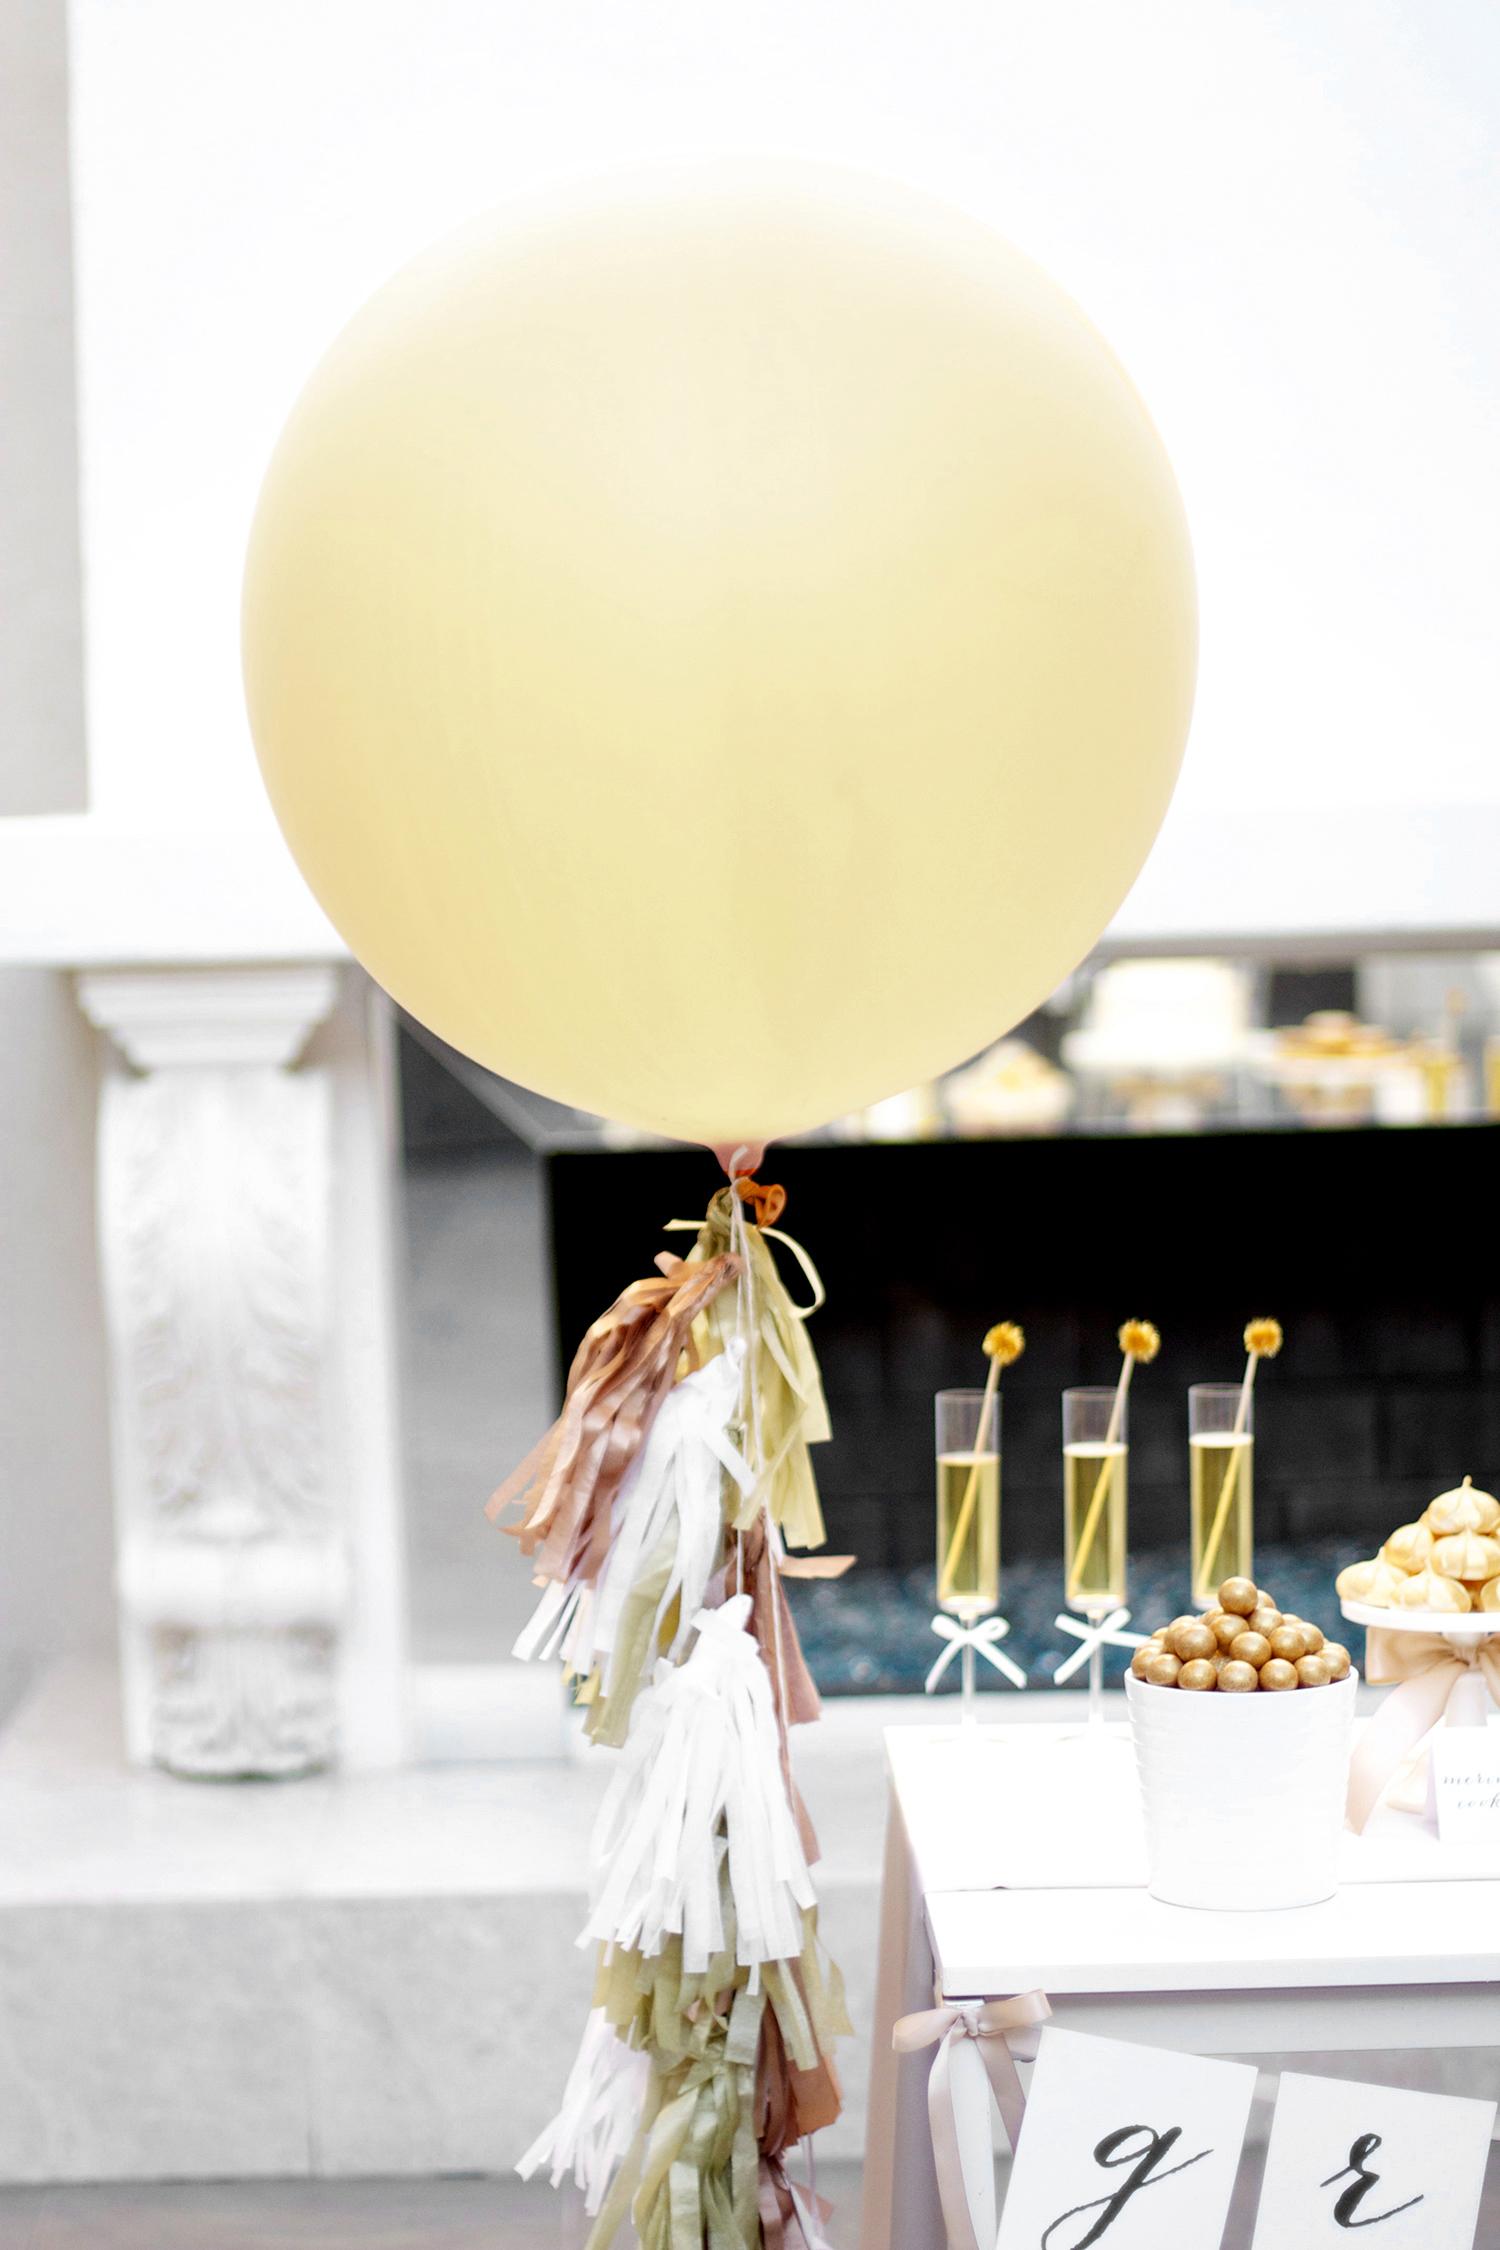 How To Make Balloon Tassels.jpg